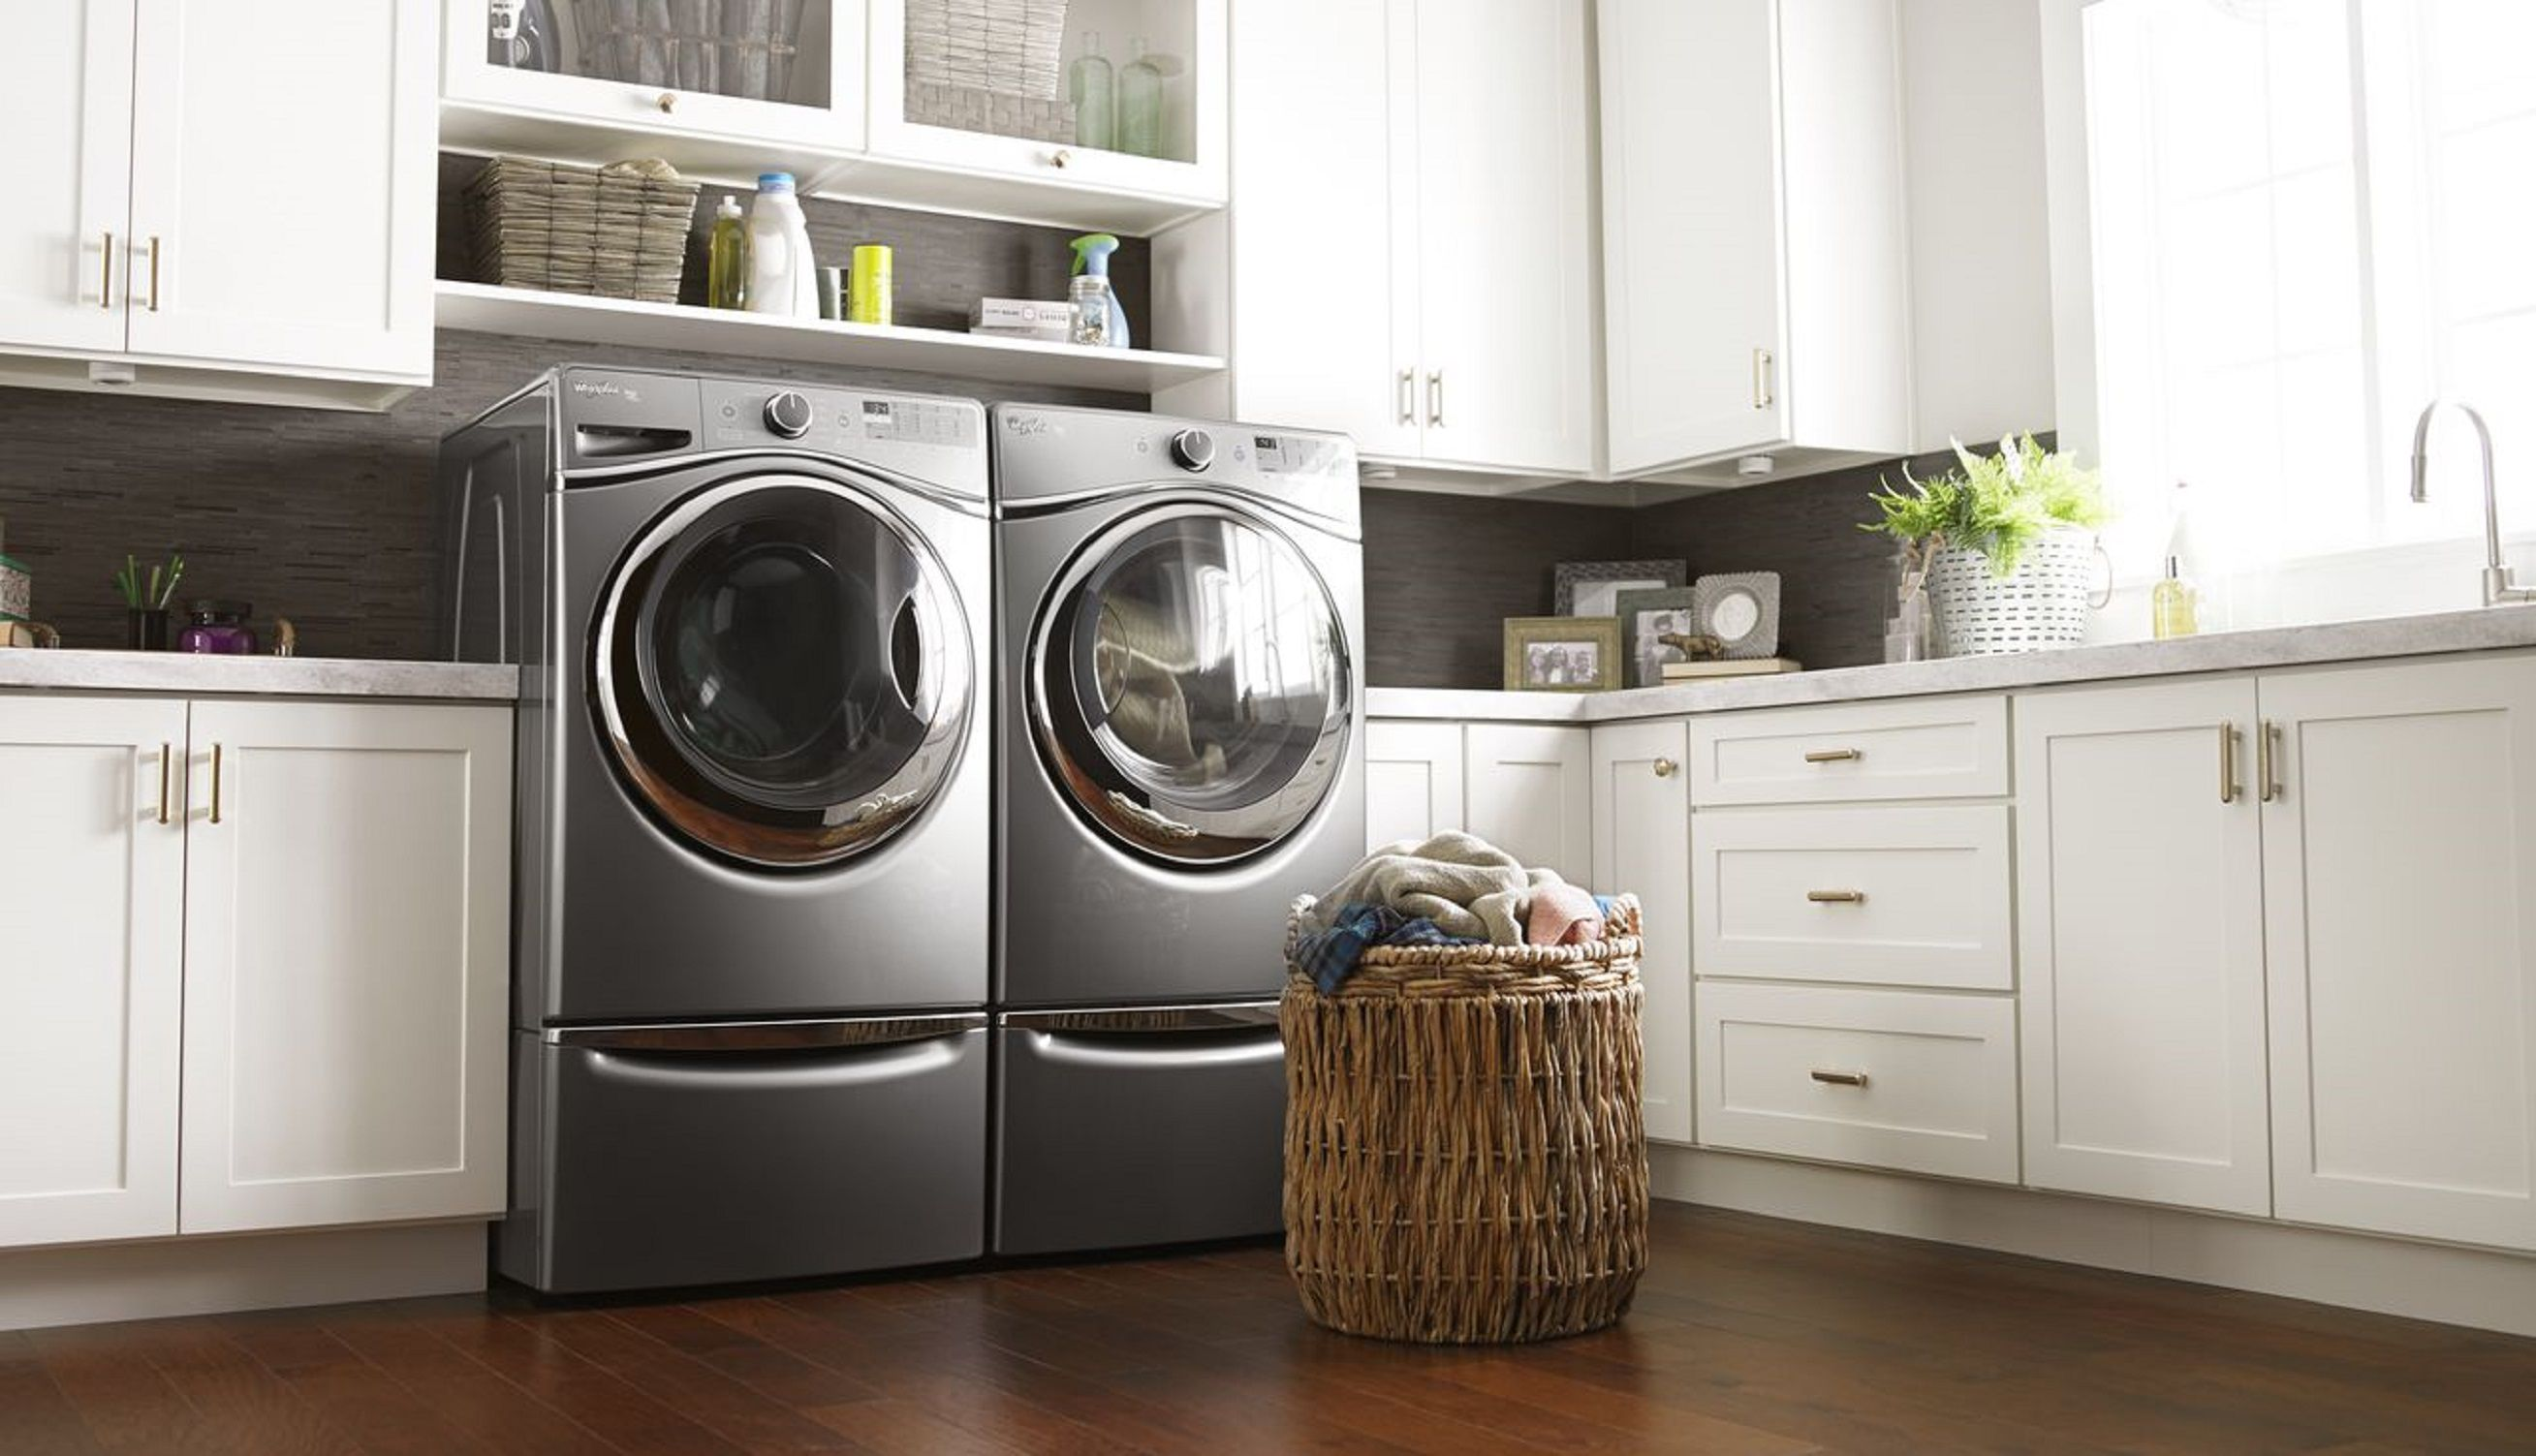 Whirlpool Duet Washer And Dryer Problems Repairs New Maytag Bravos Electric Motor Bundadaffacom